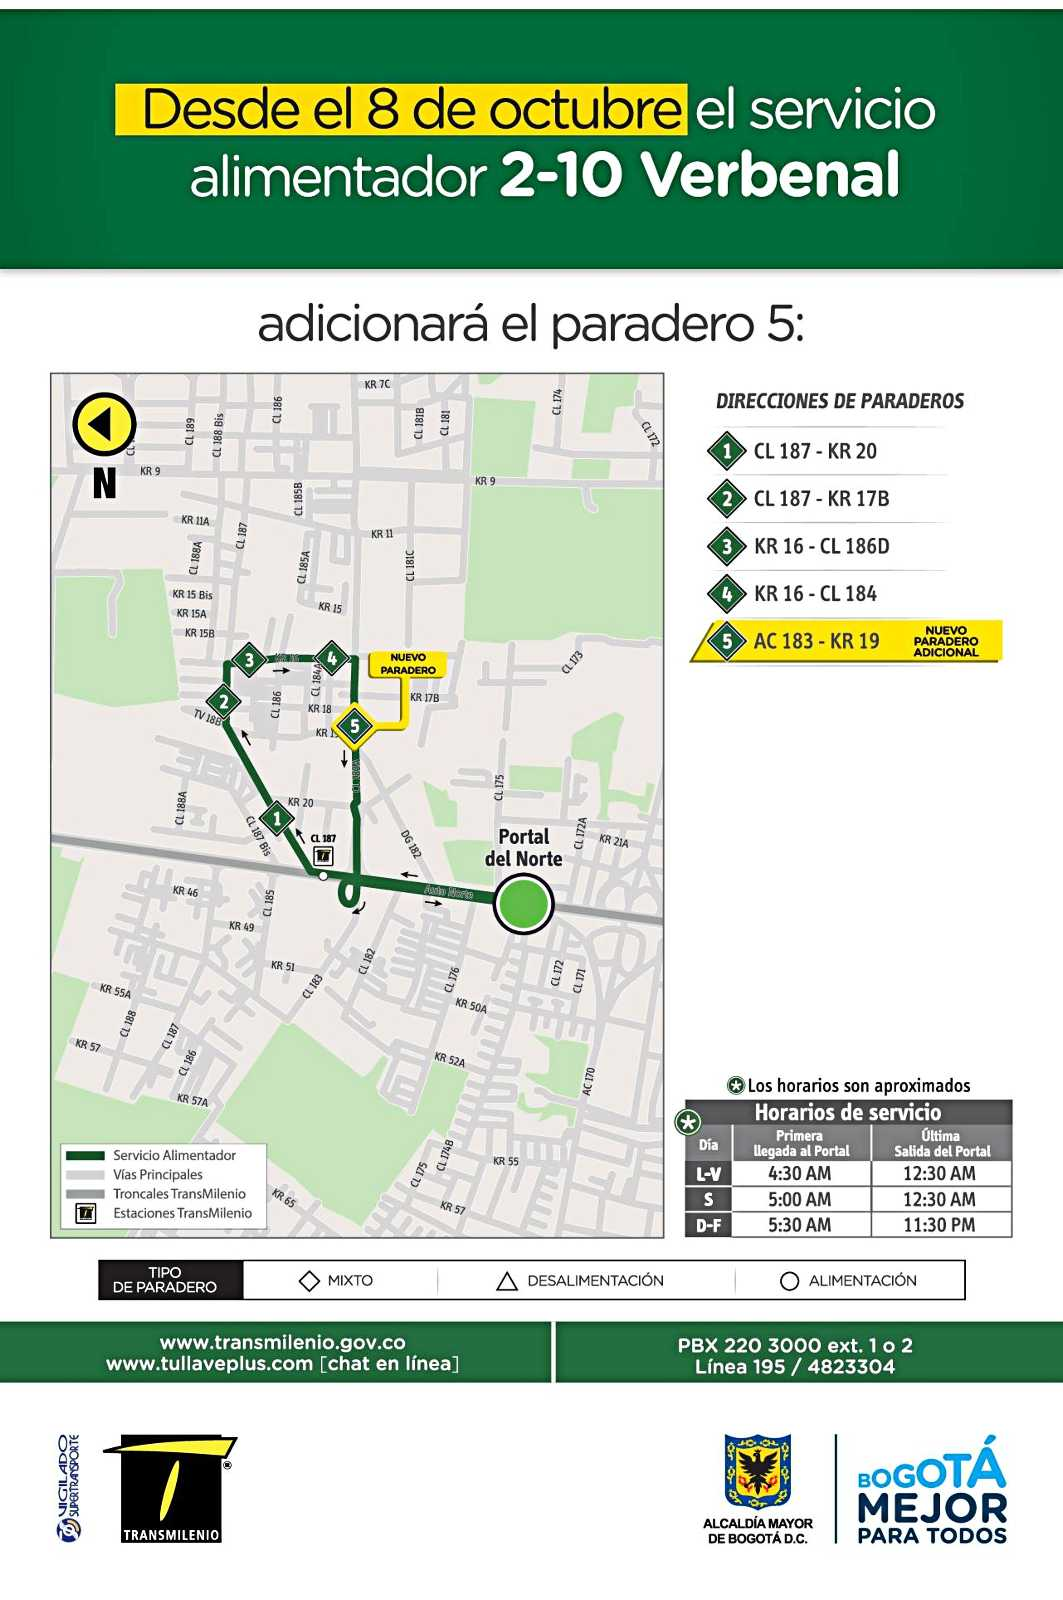 Paradas de la ruta alimentadora 2-10 Verbenal